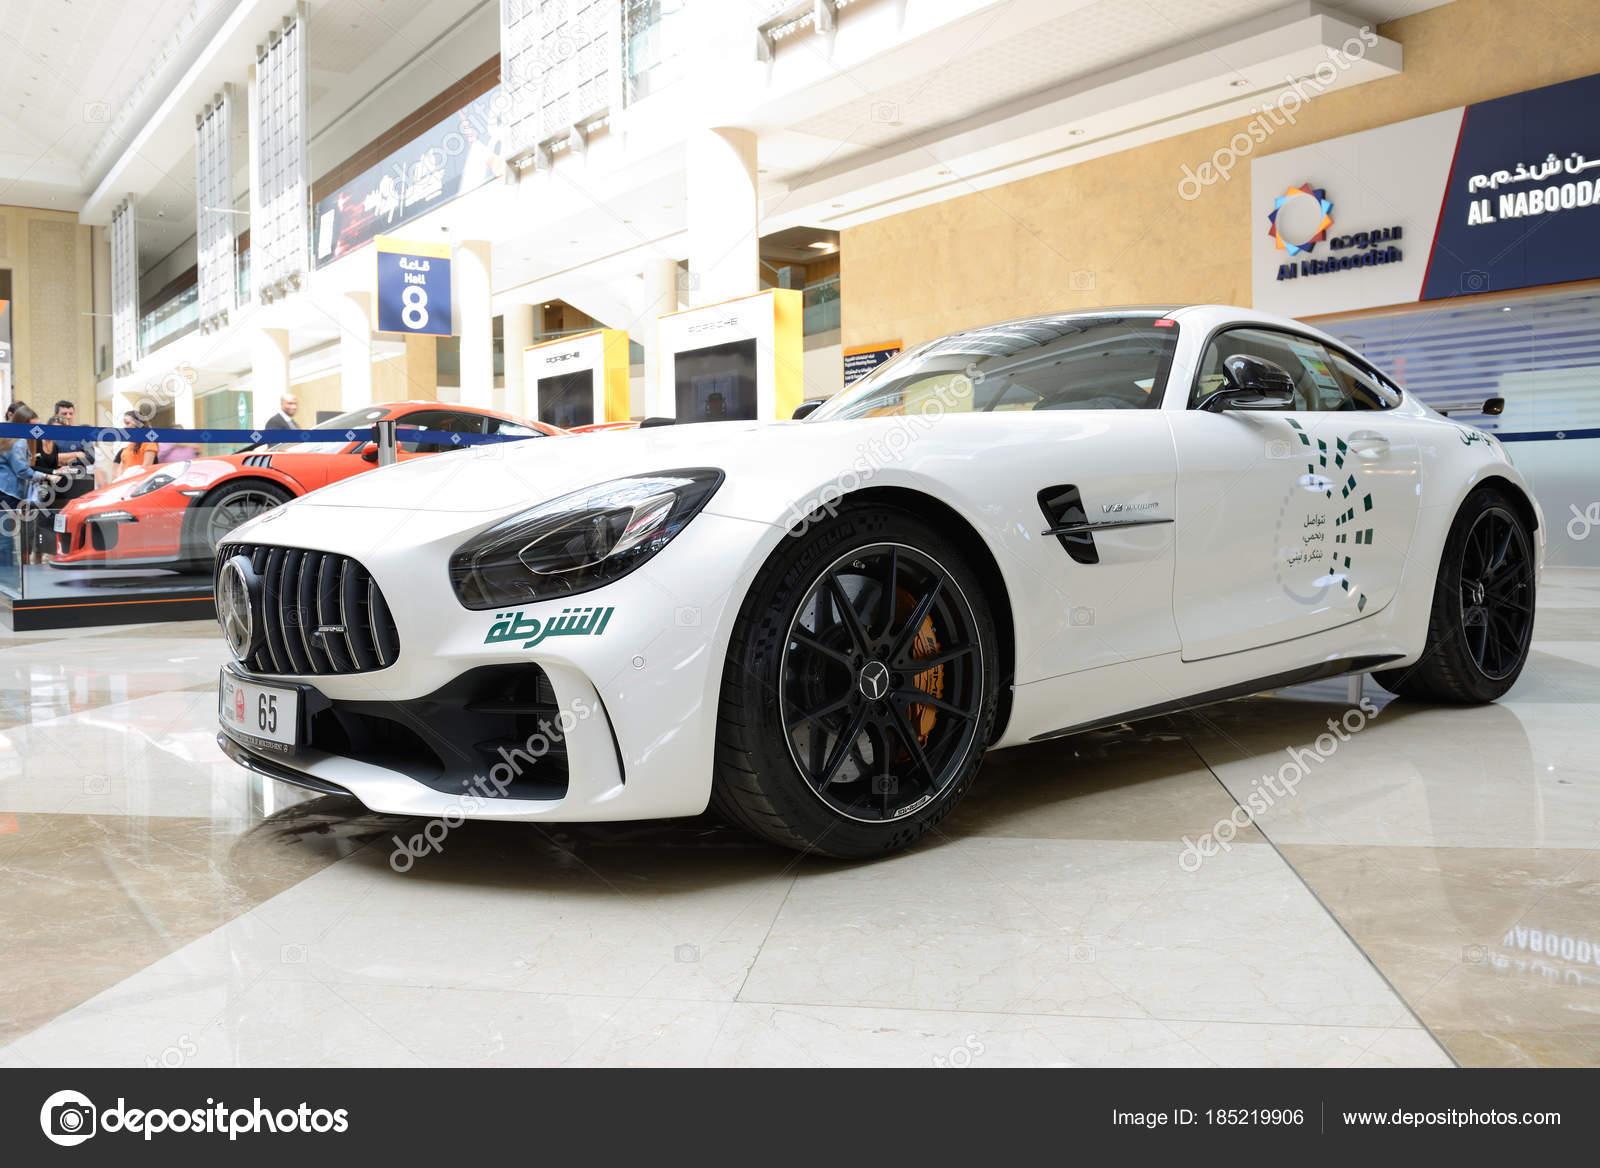 DUBAI, UAE - NOVEMBER 18: The Mercedes Benz GT R coupe of